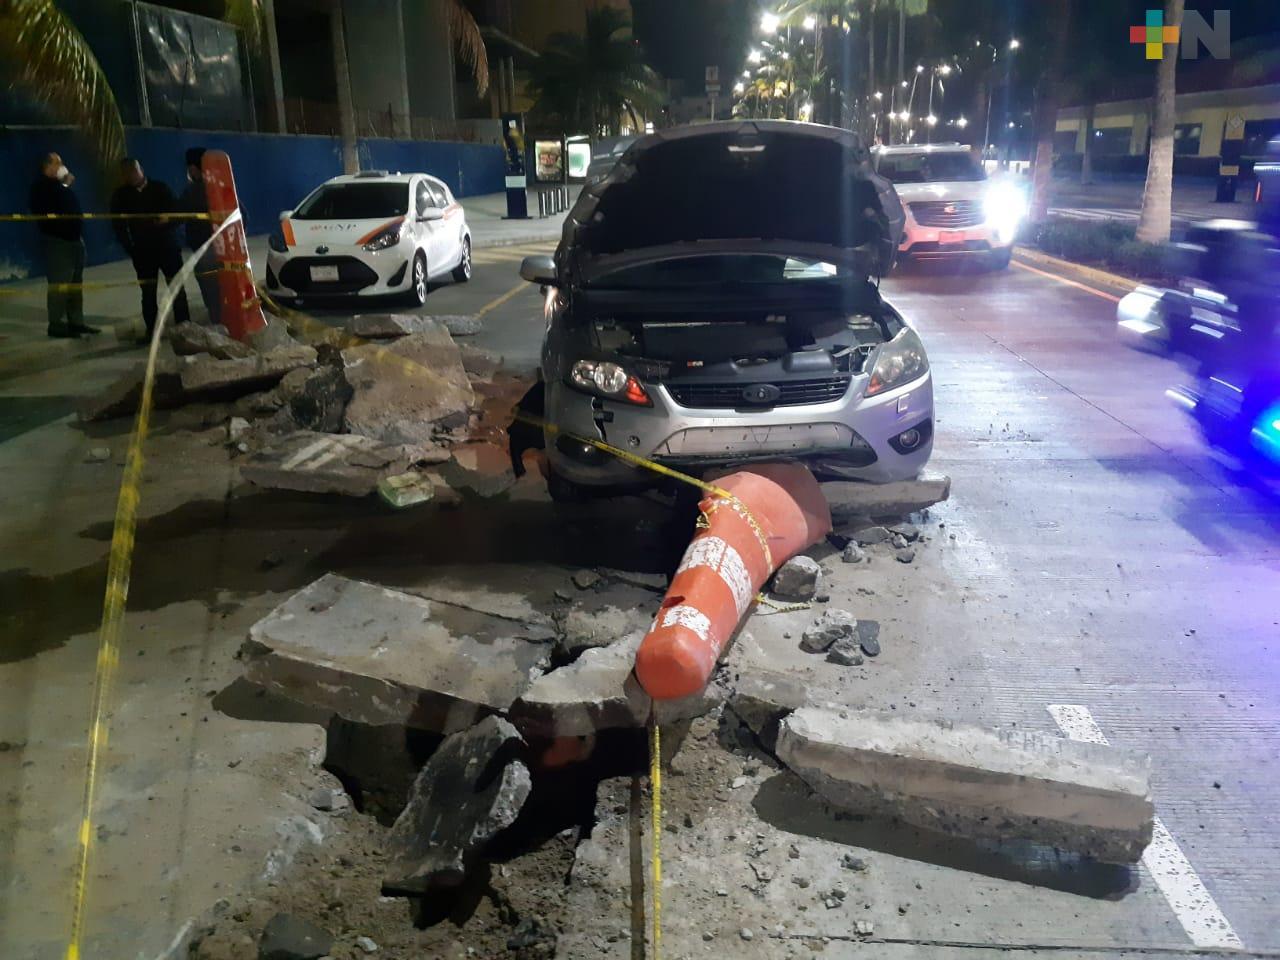 Vehículo se estrelló contra escombros en bulevar costero de Veracruz